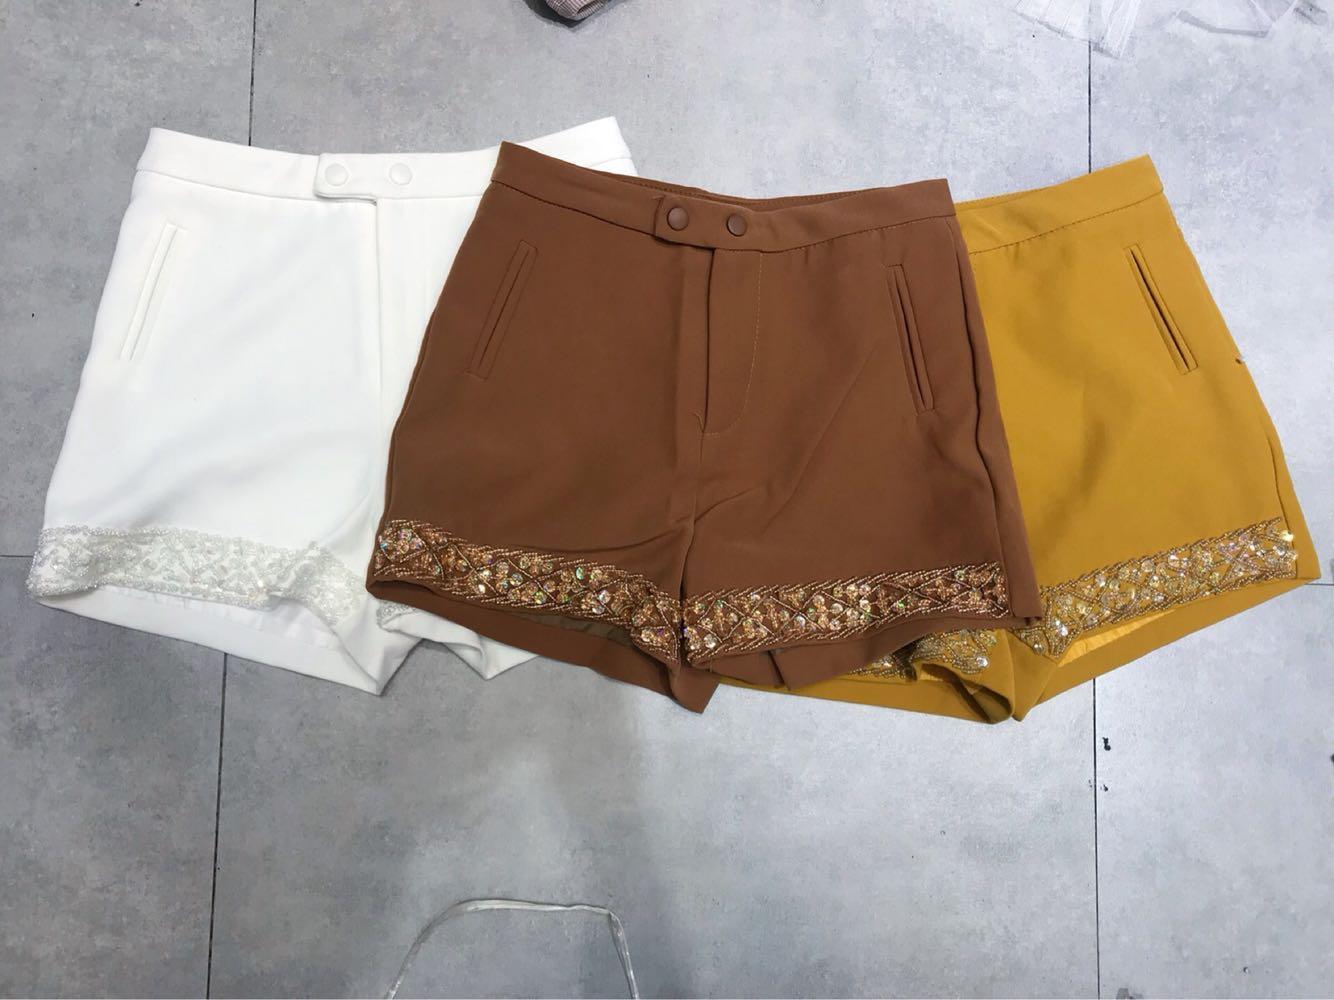 Twelve Color Purple new Thai fashion brand heavy industry nail bead casual versatile fashion shorts